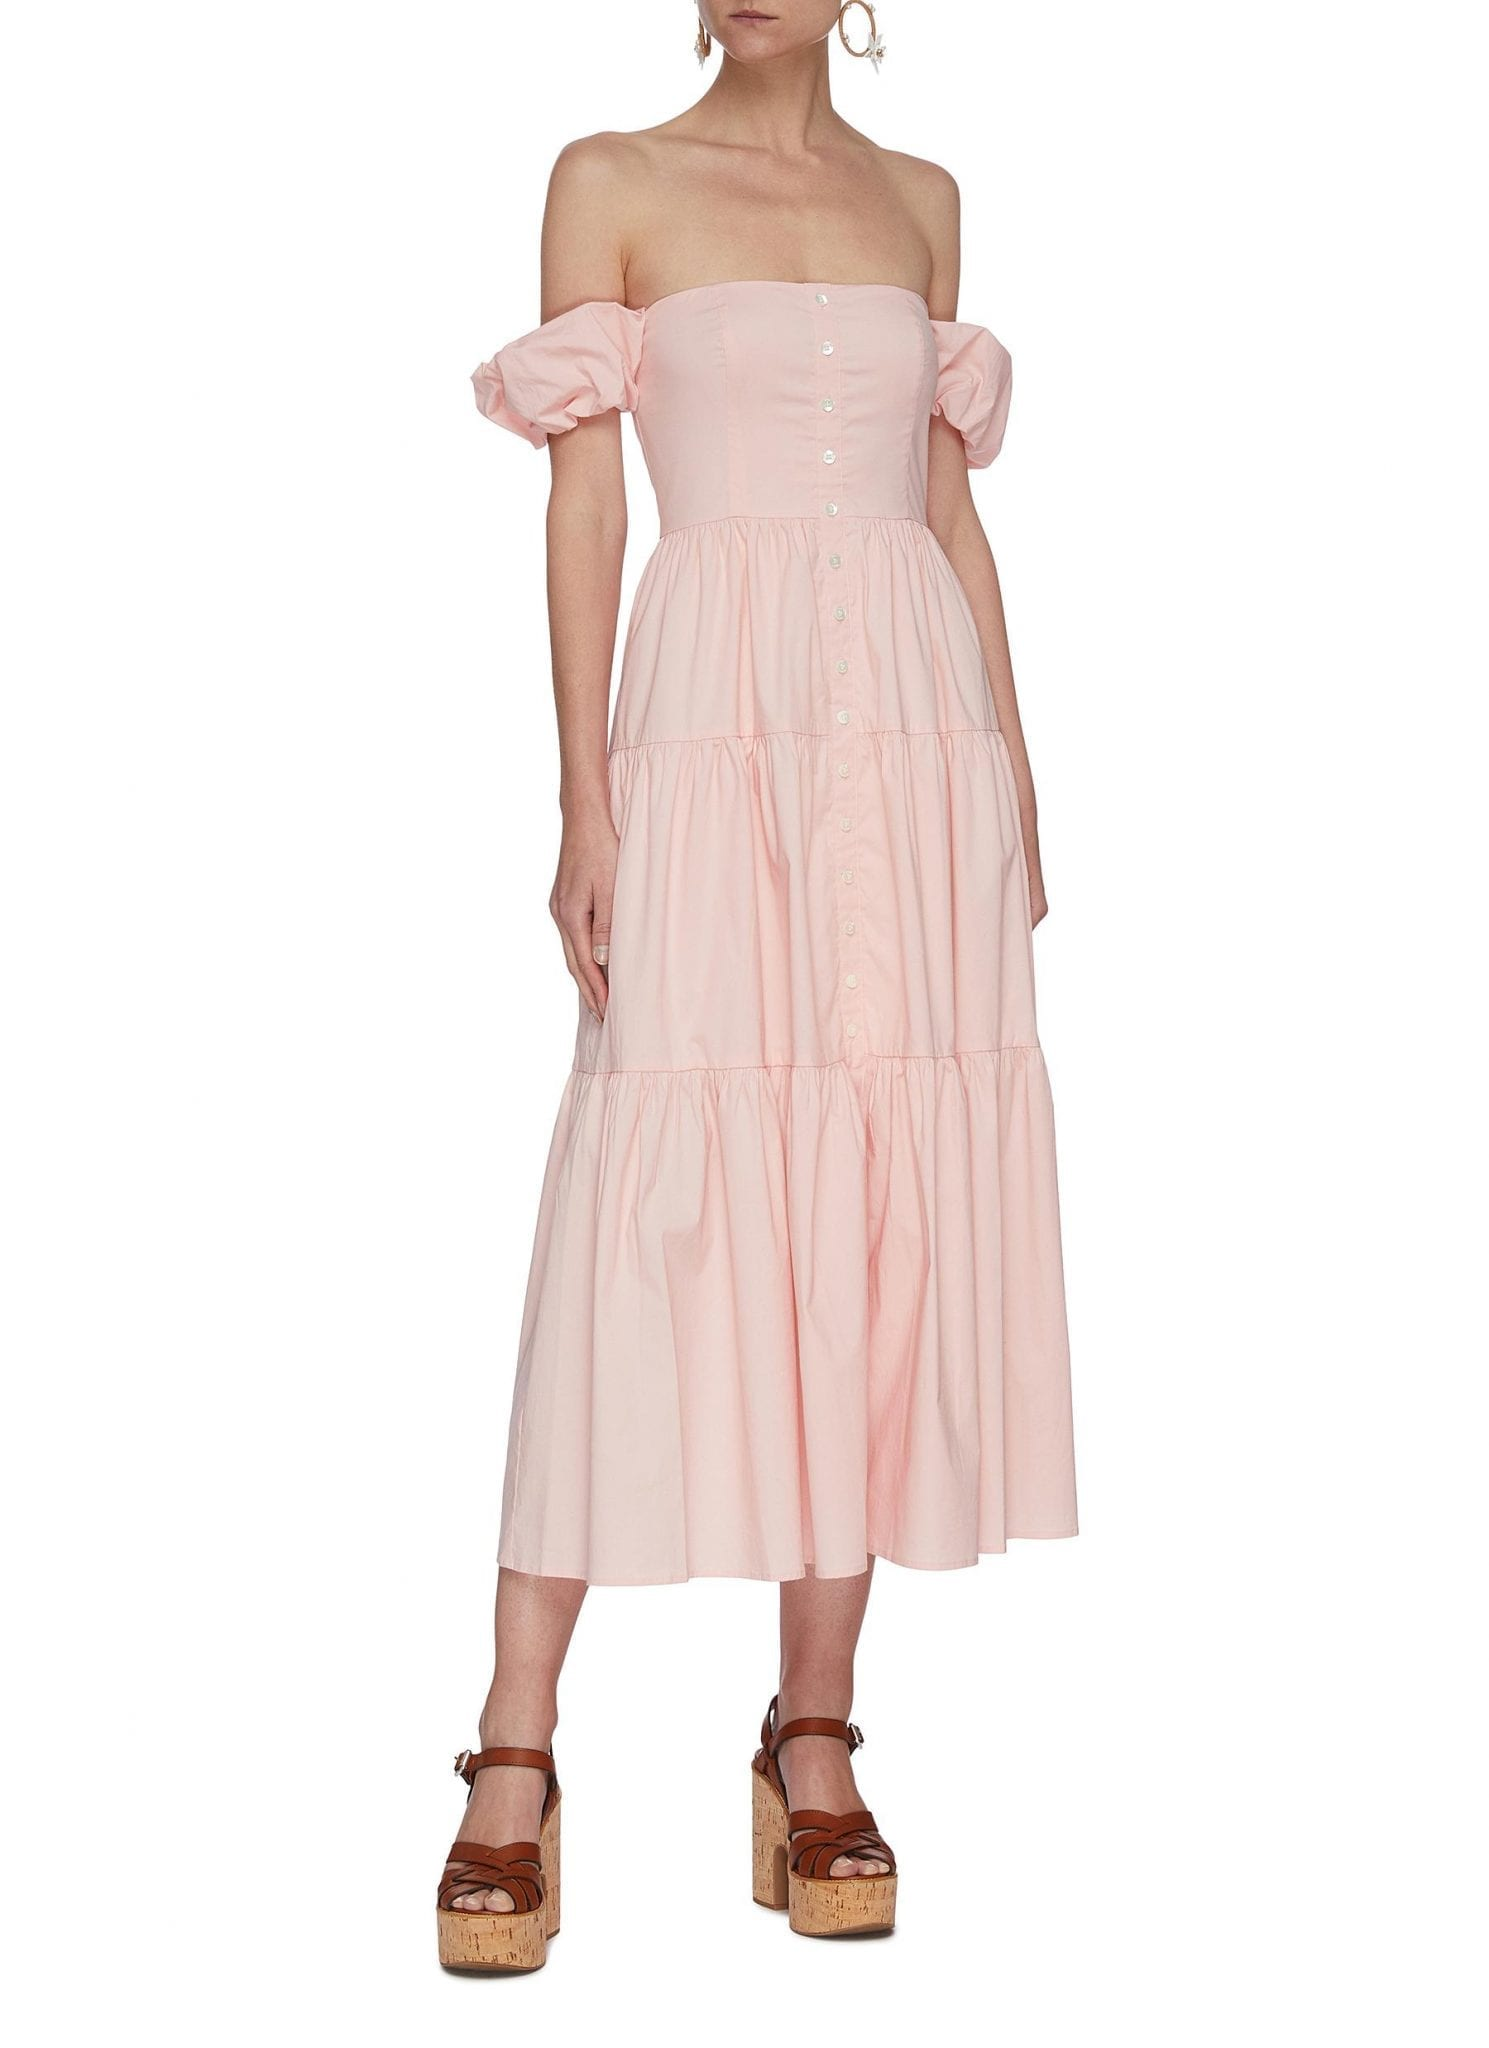 STAUD 'Elio' Off Shoulder Puff Sleeve Dress